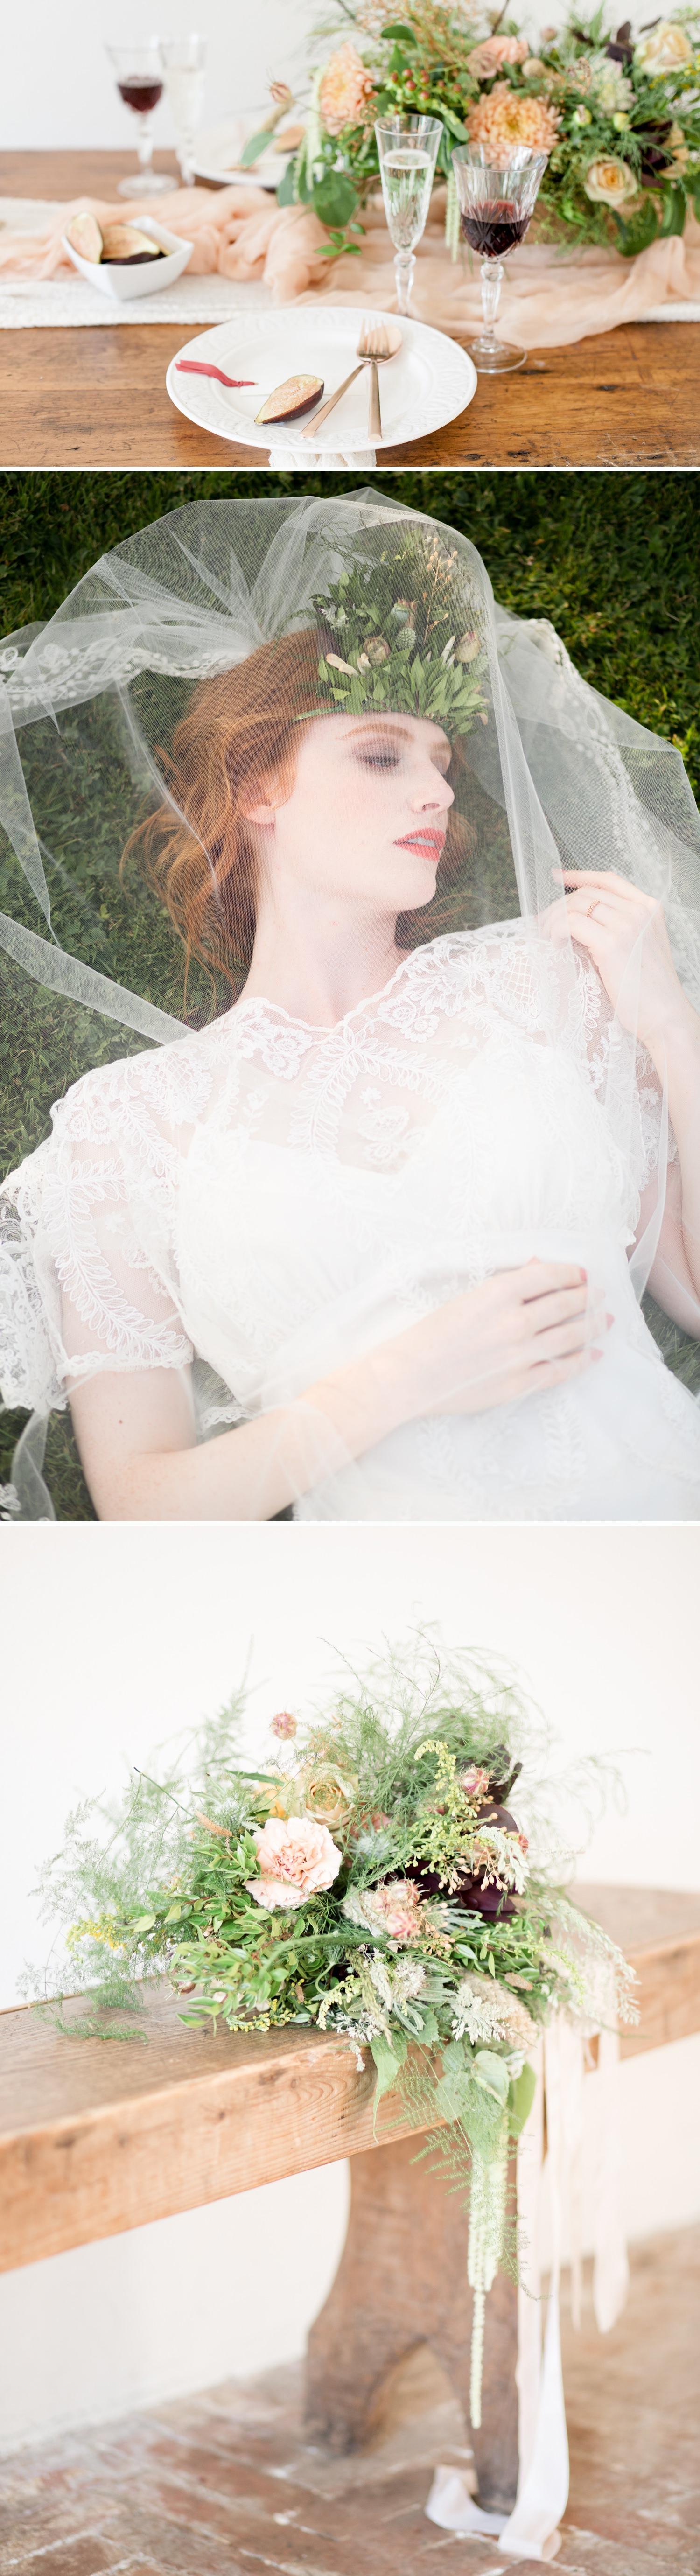 West Sussex Wedding Photographer - an elegant and refined Fine Art Wedding at Bignor Park